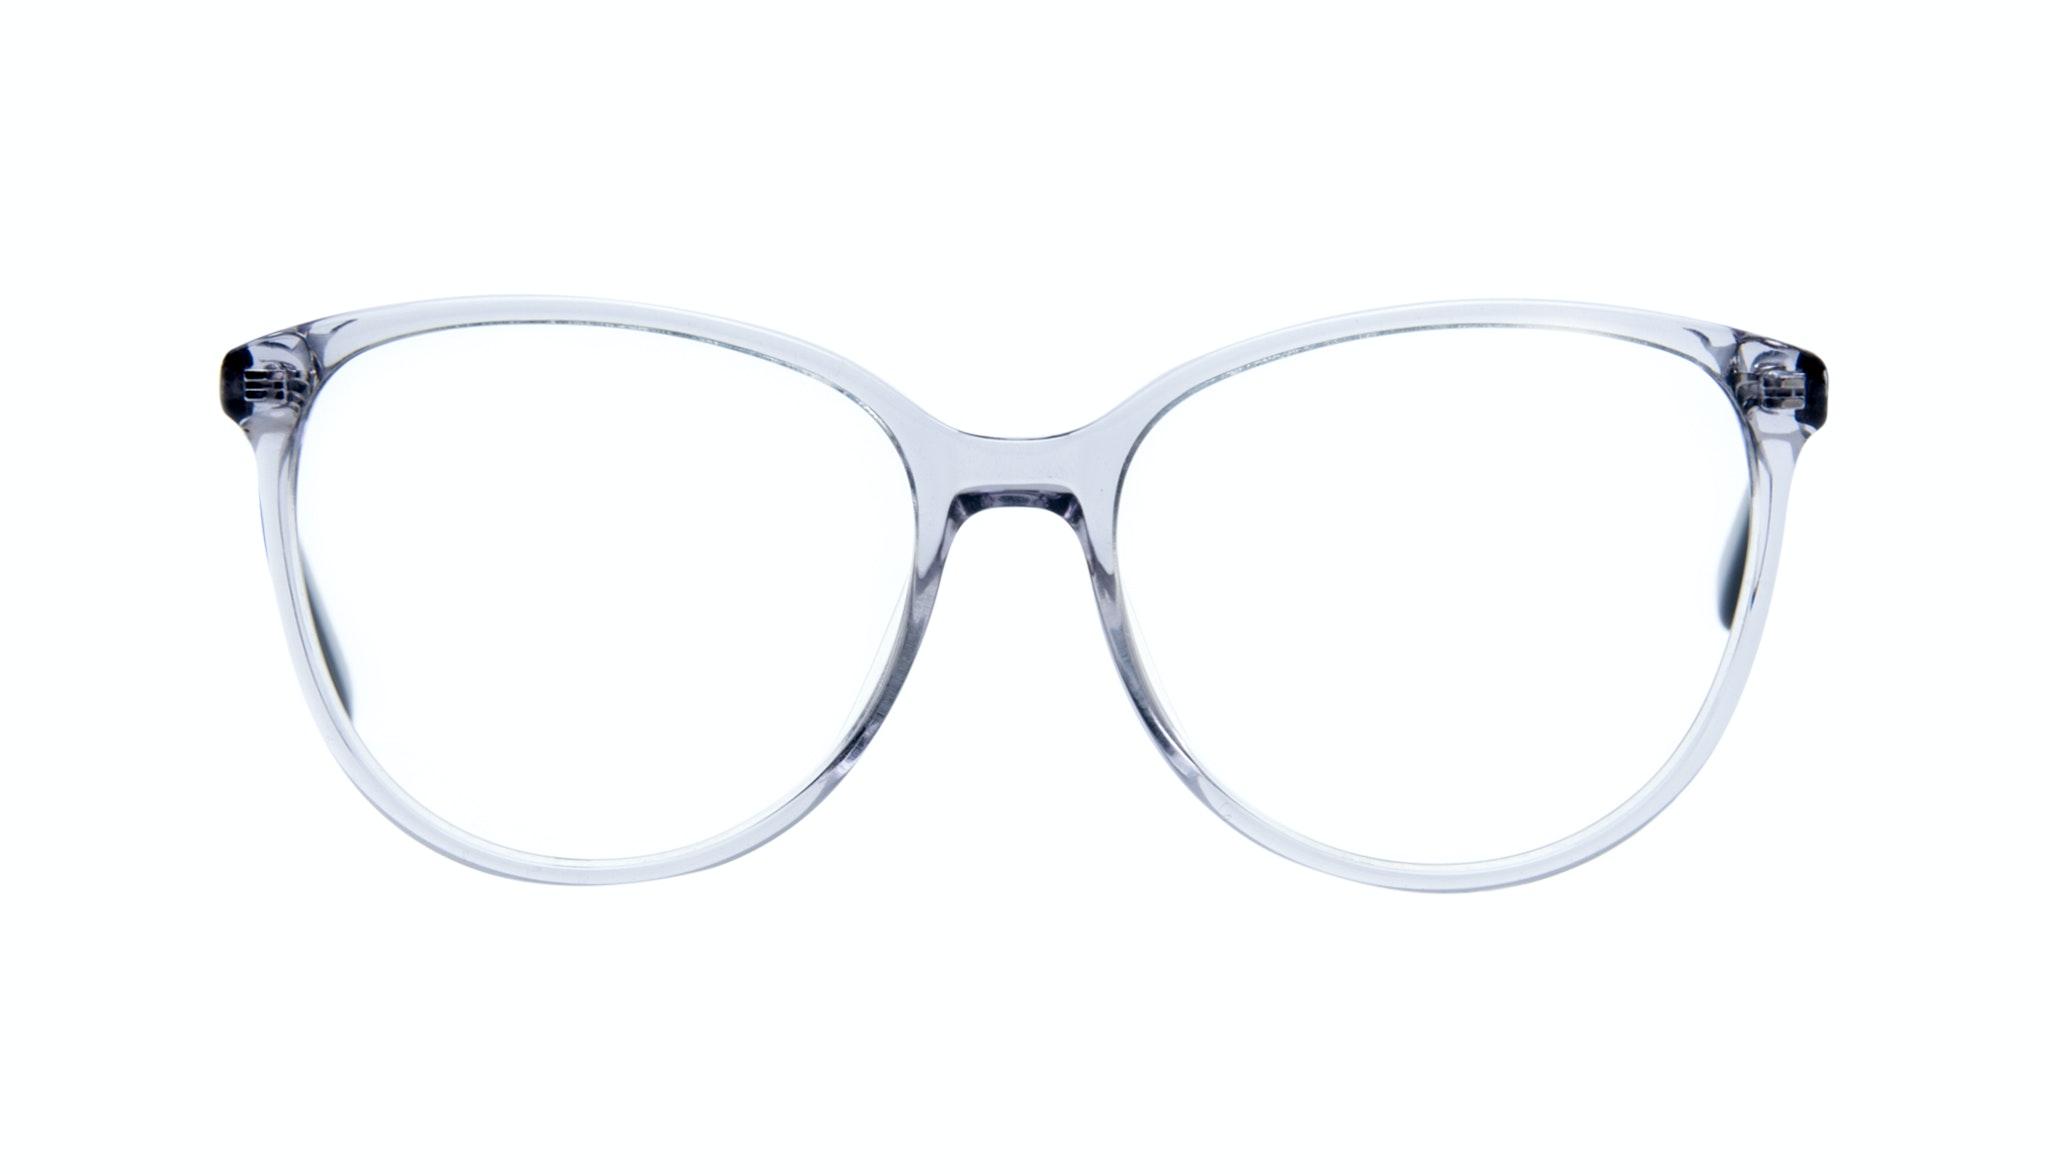 Affordable Fashion Glasses Cat Eye Round Eyeglasses Women Imagine Grey Metal Front